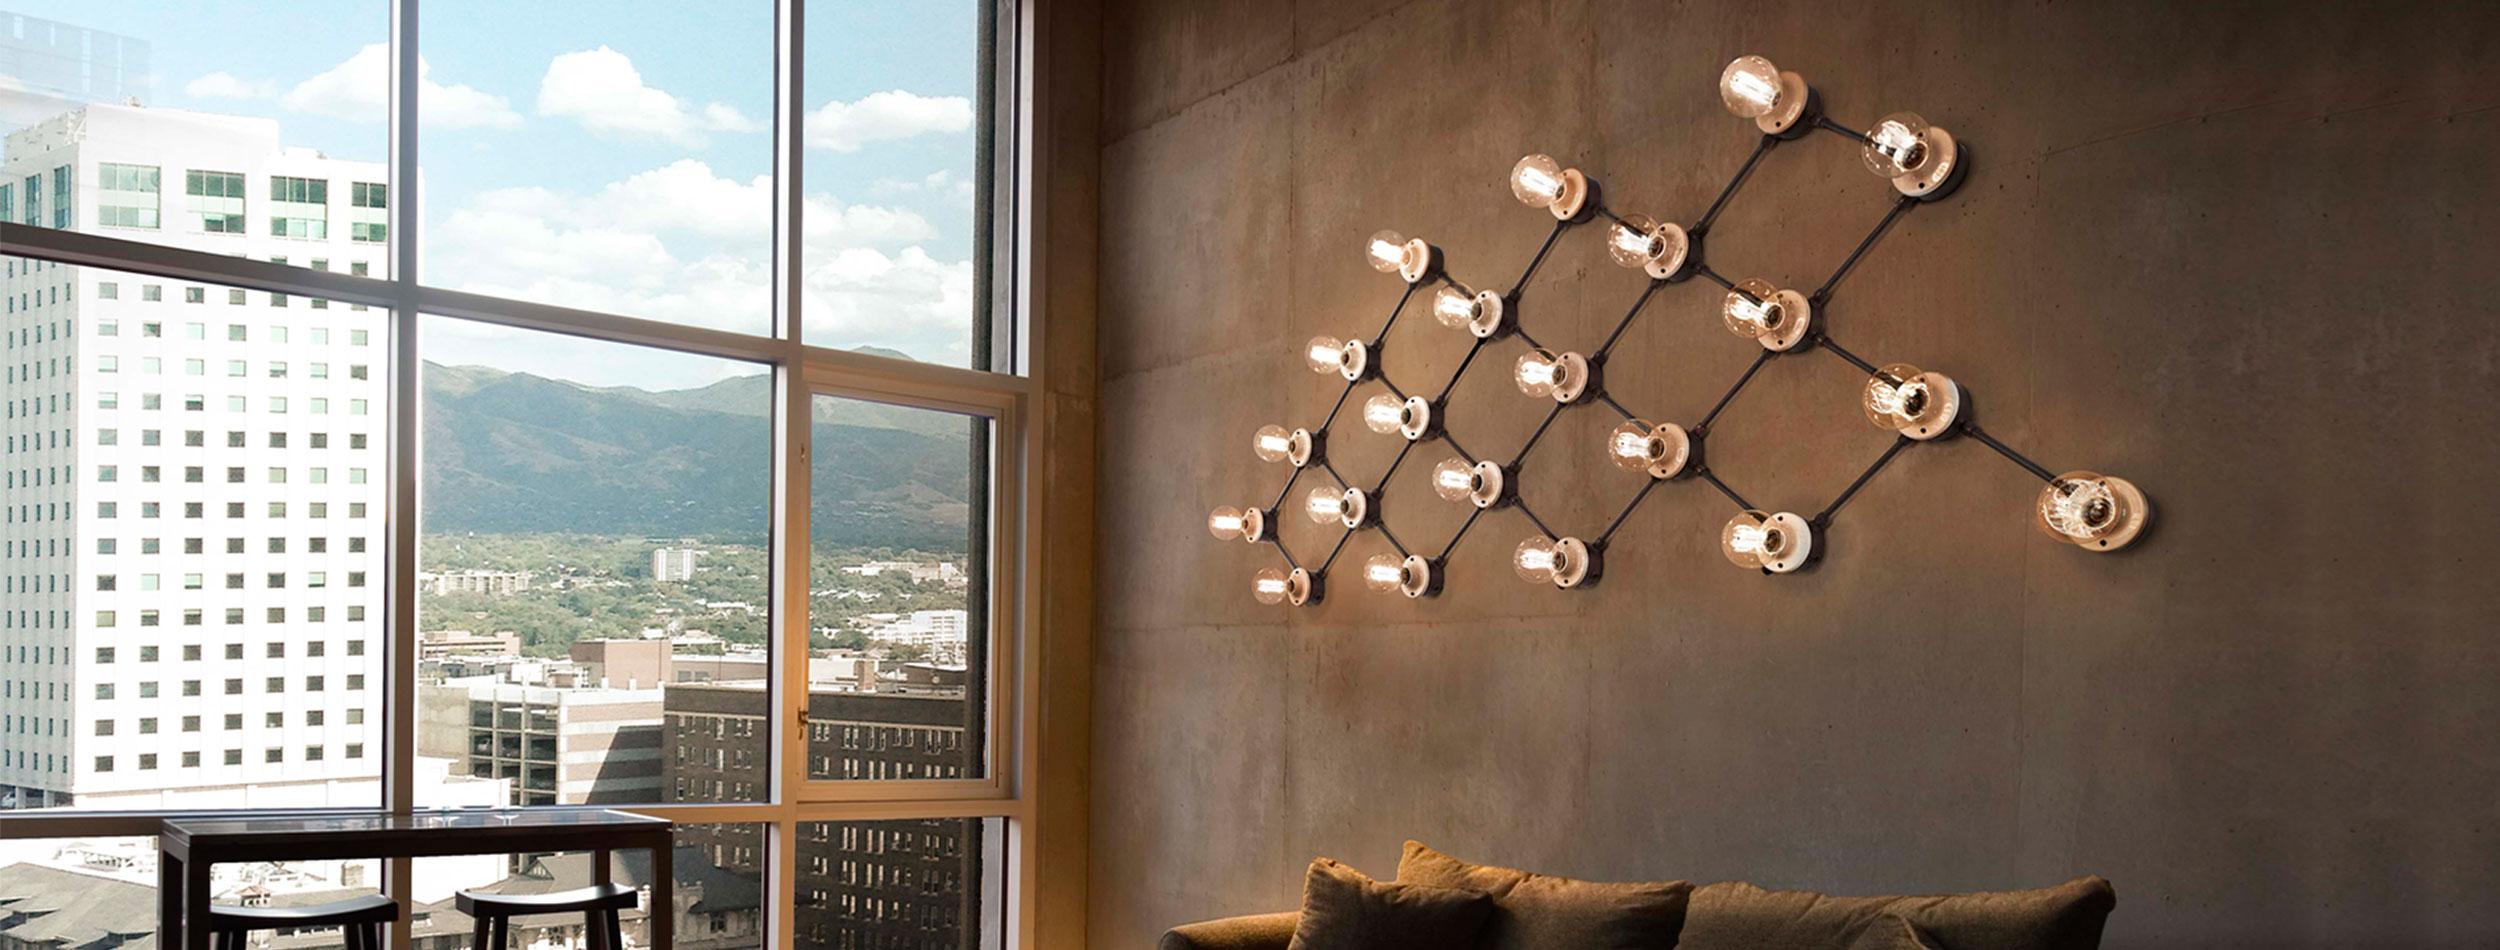 Stunning Design Verlichting Outlet Belgie inspiratie - Woonkamer ...